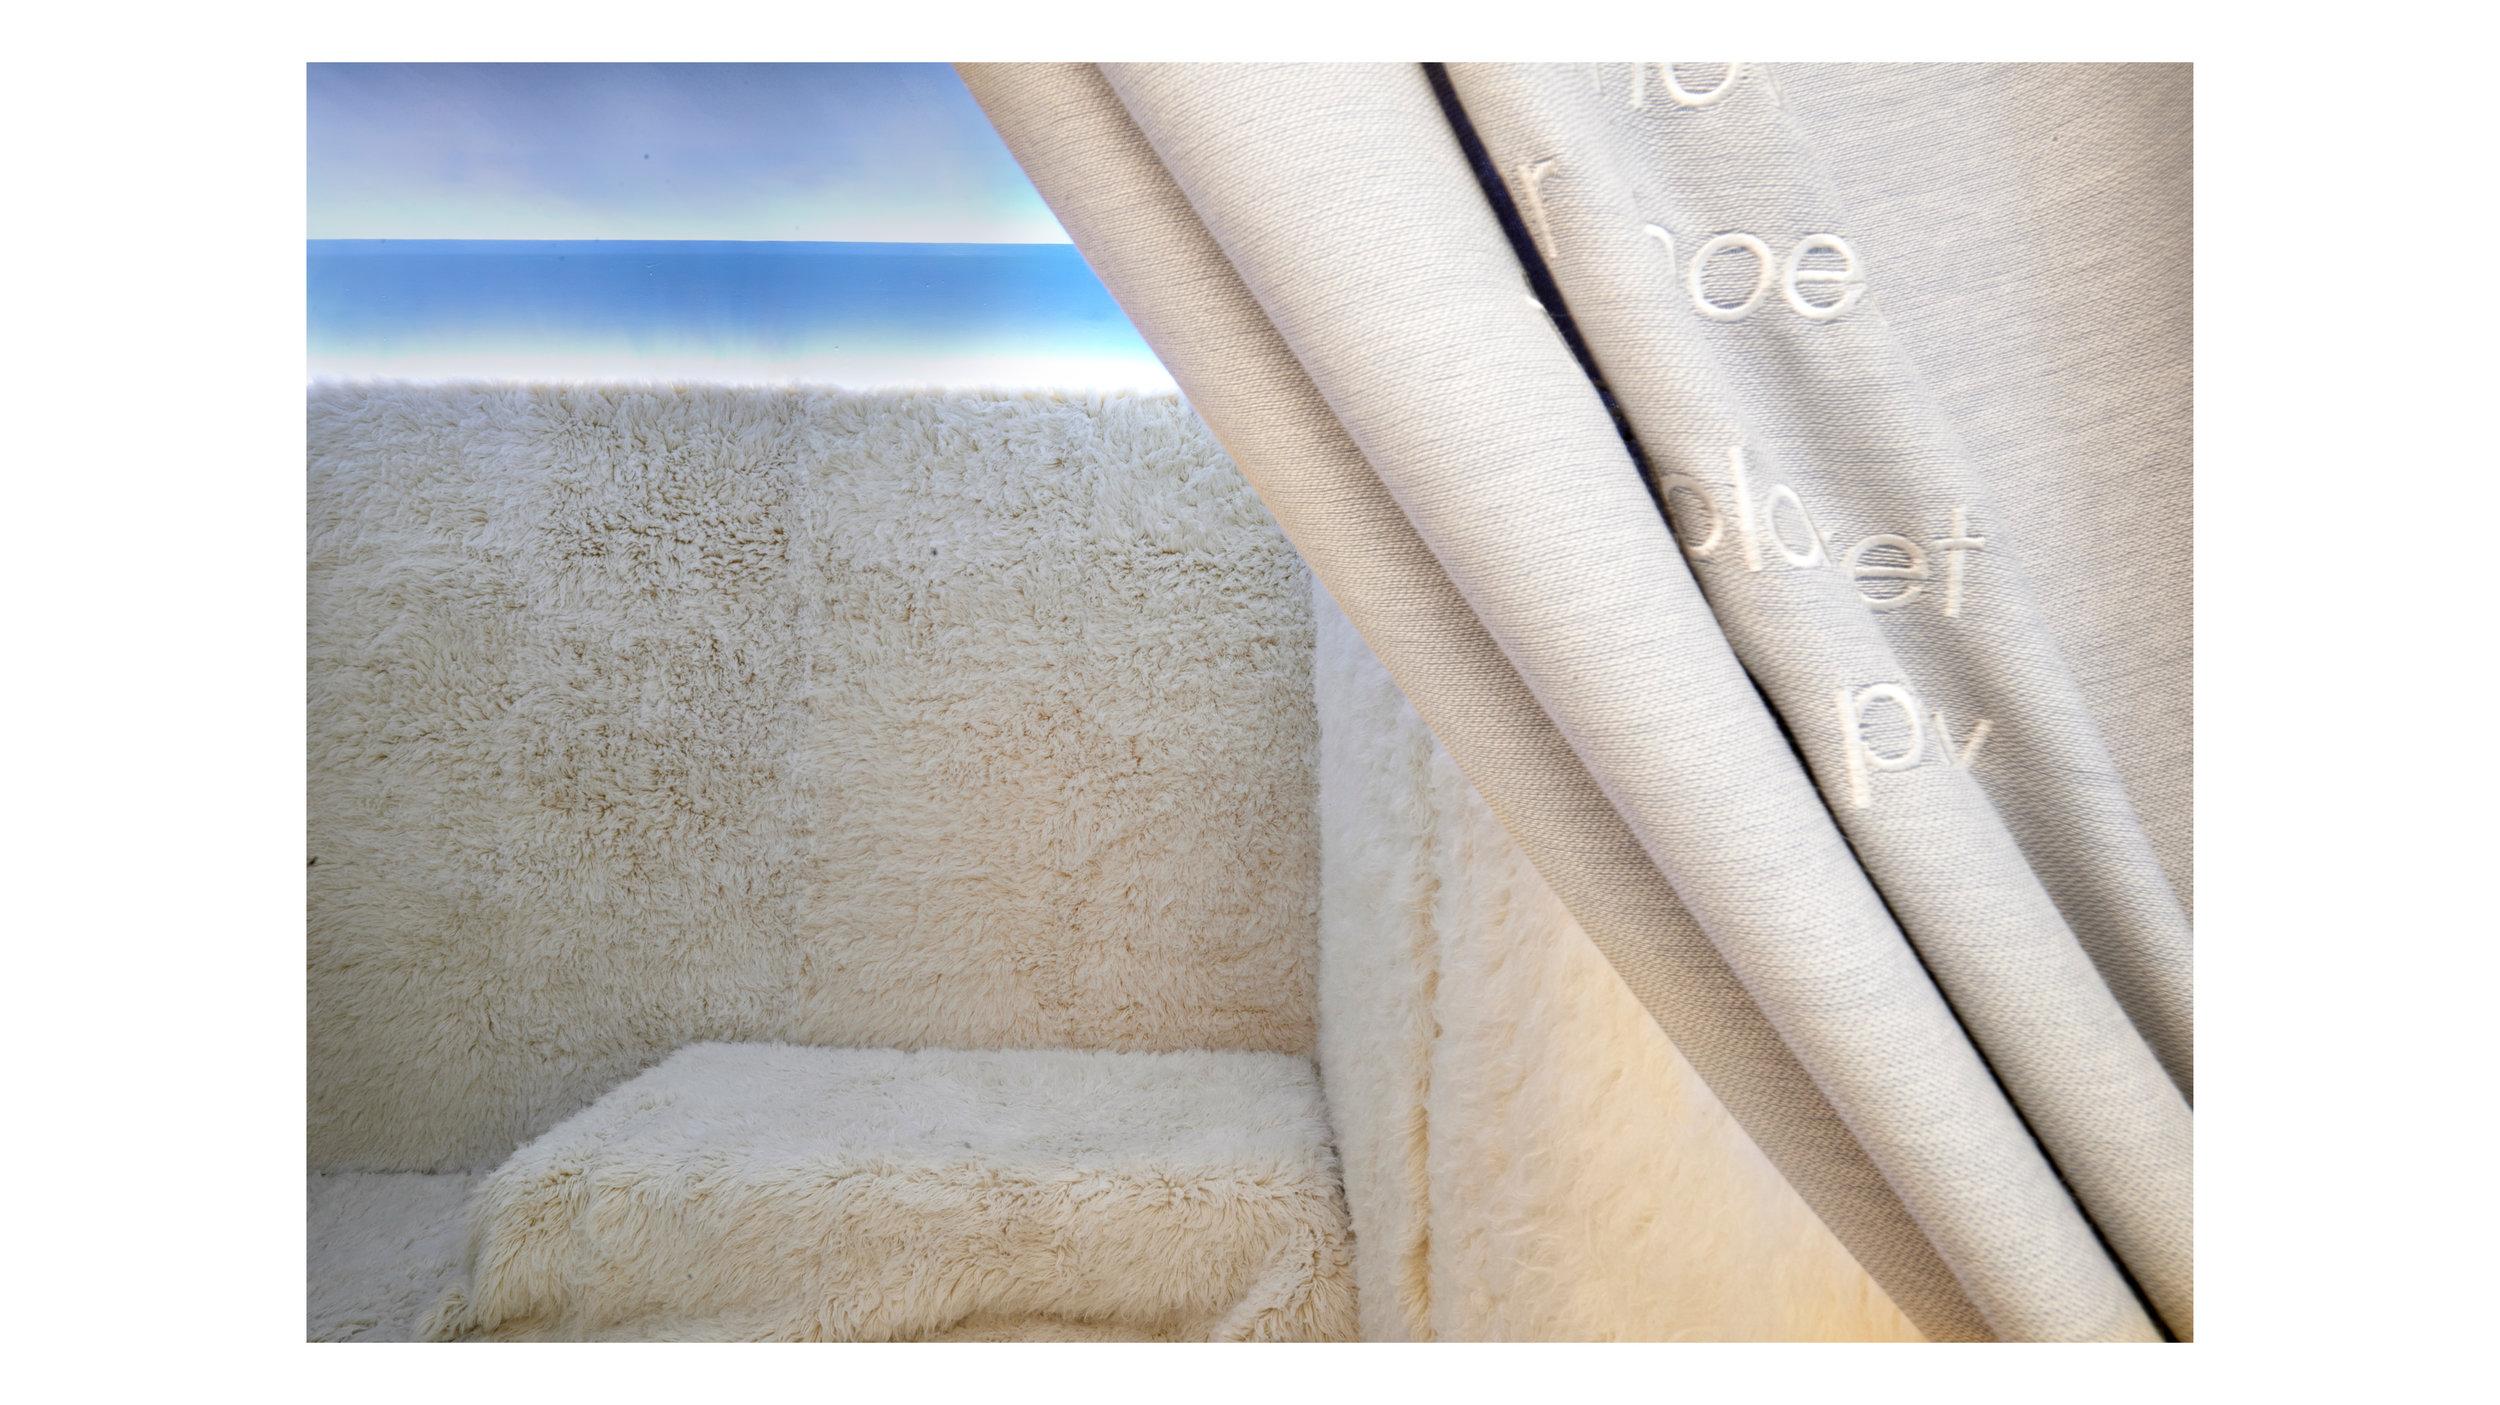 roomtodream_web5.jpg